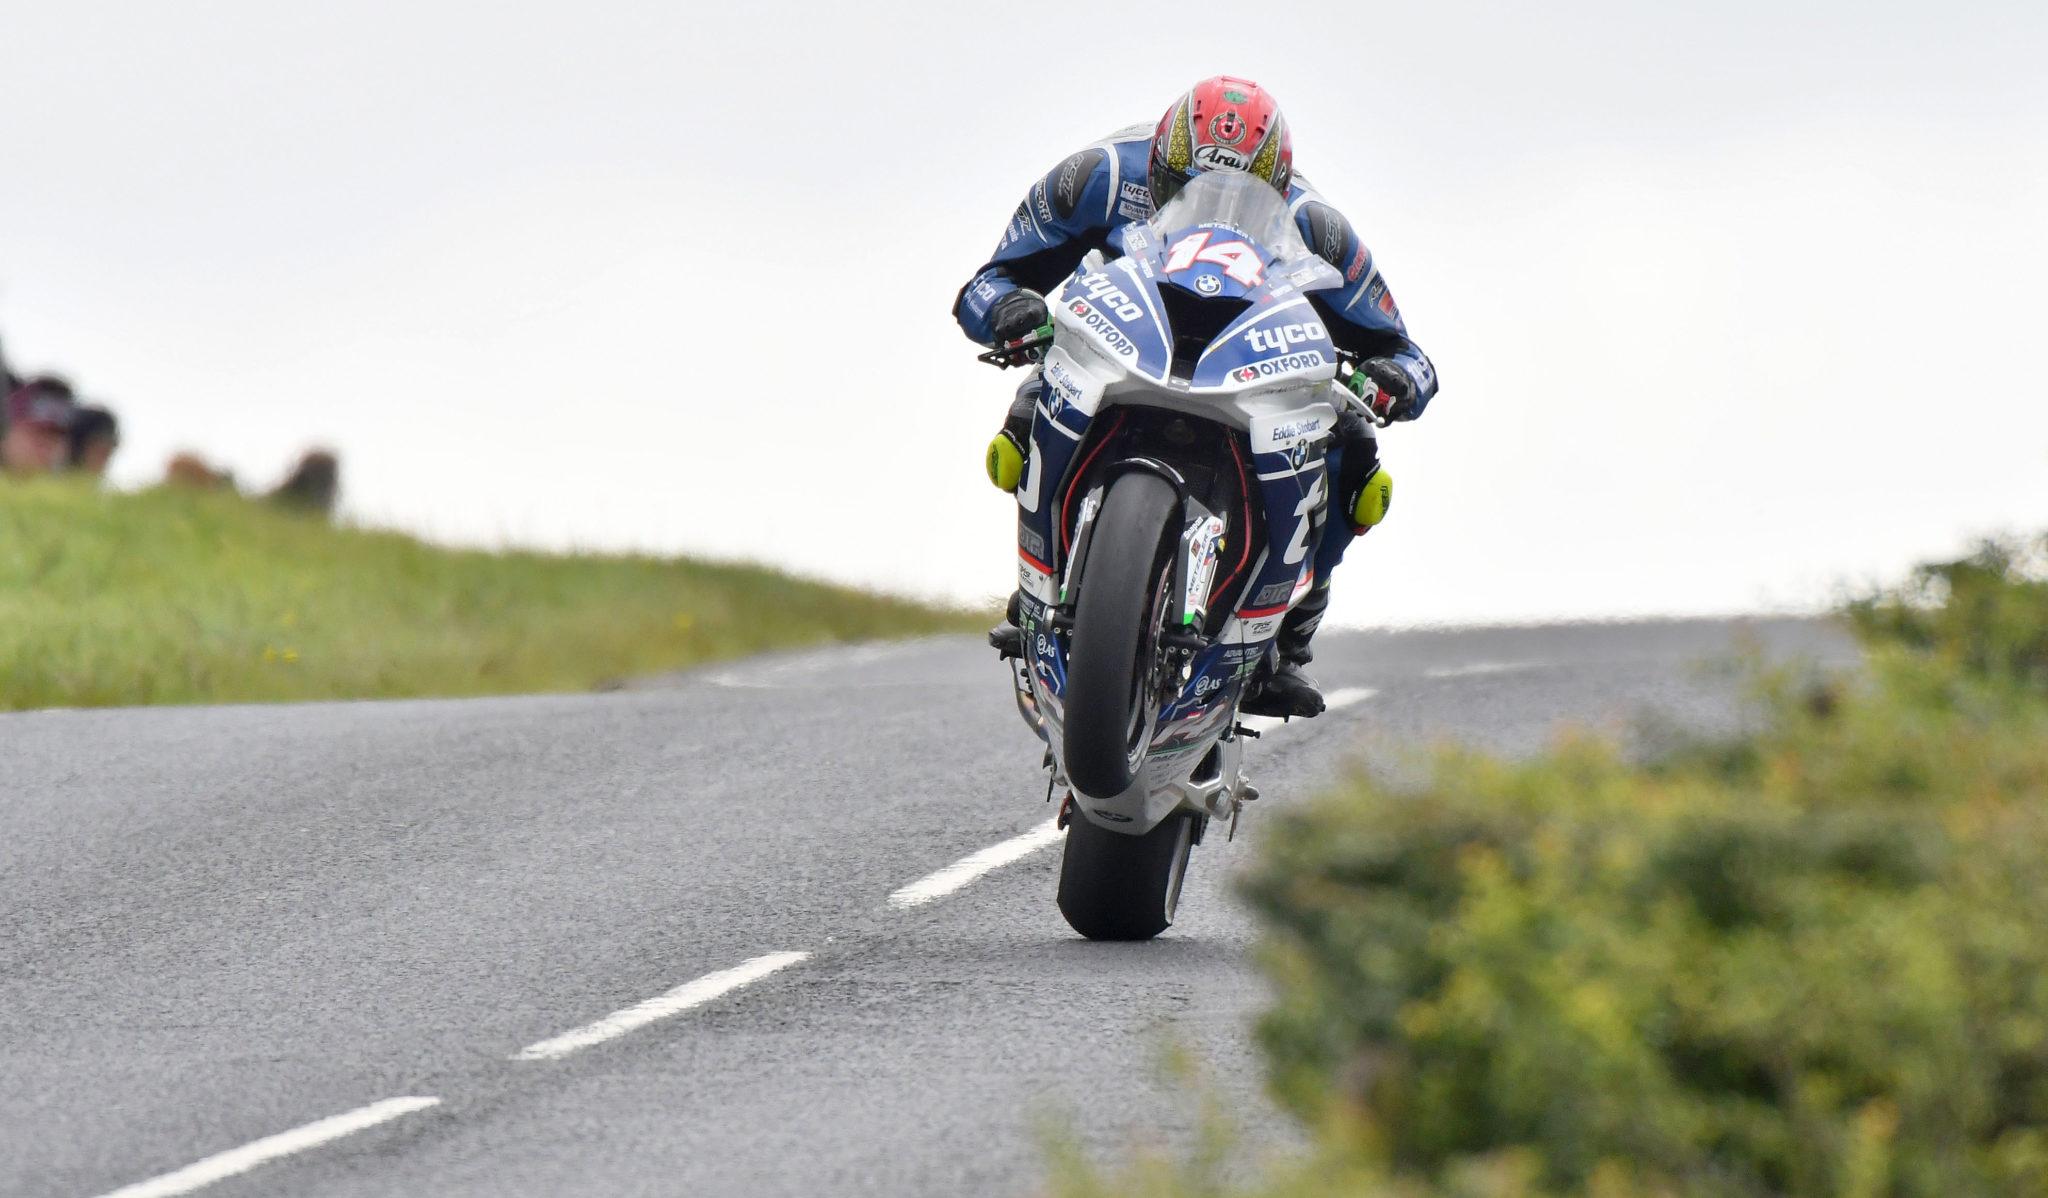 Dan Kneen Ulster GP 2017 image credit Pacemaker Press International